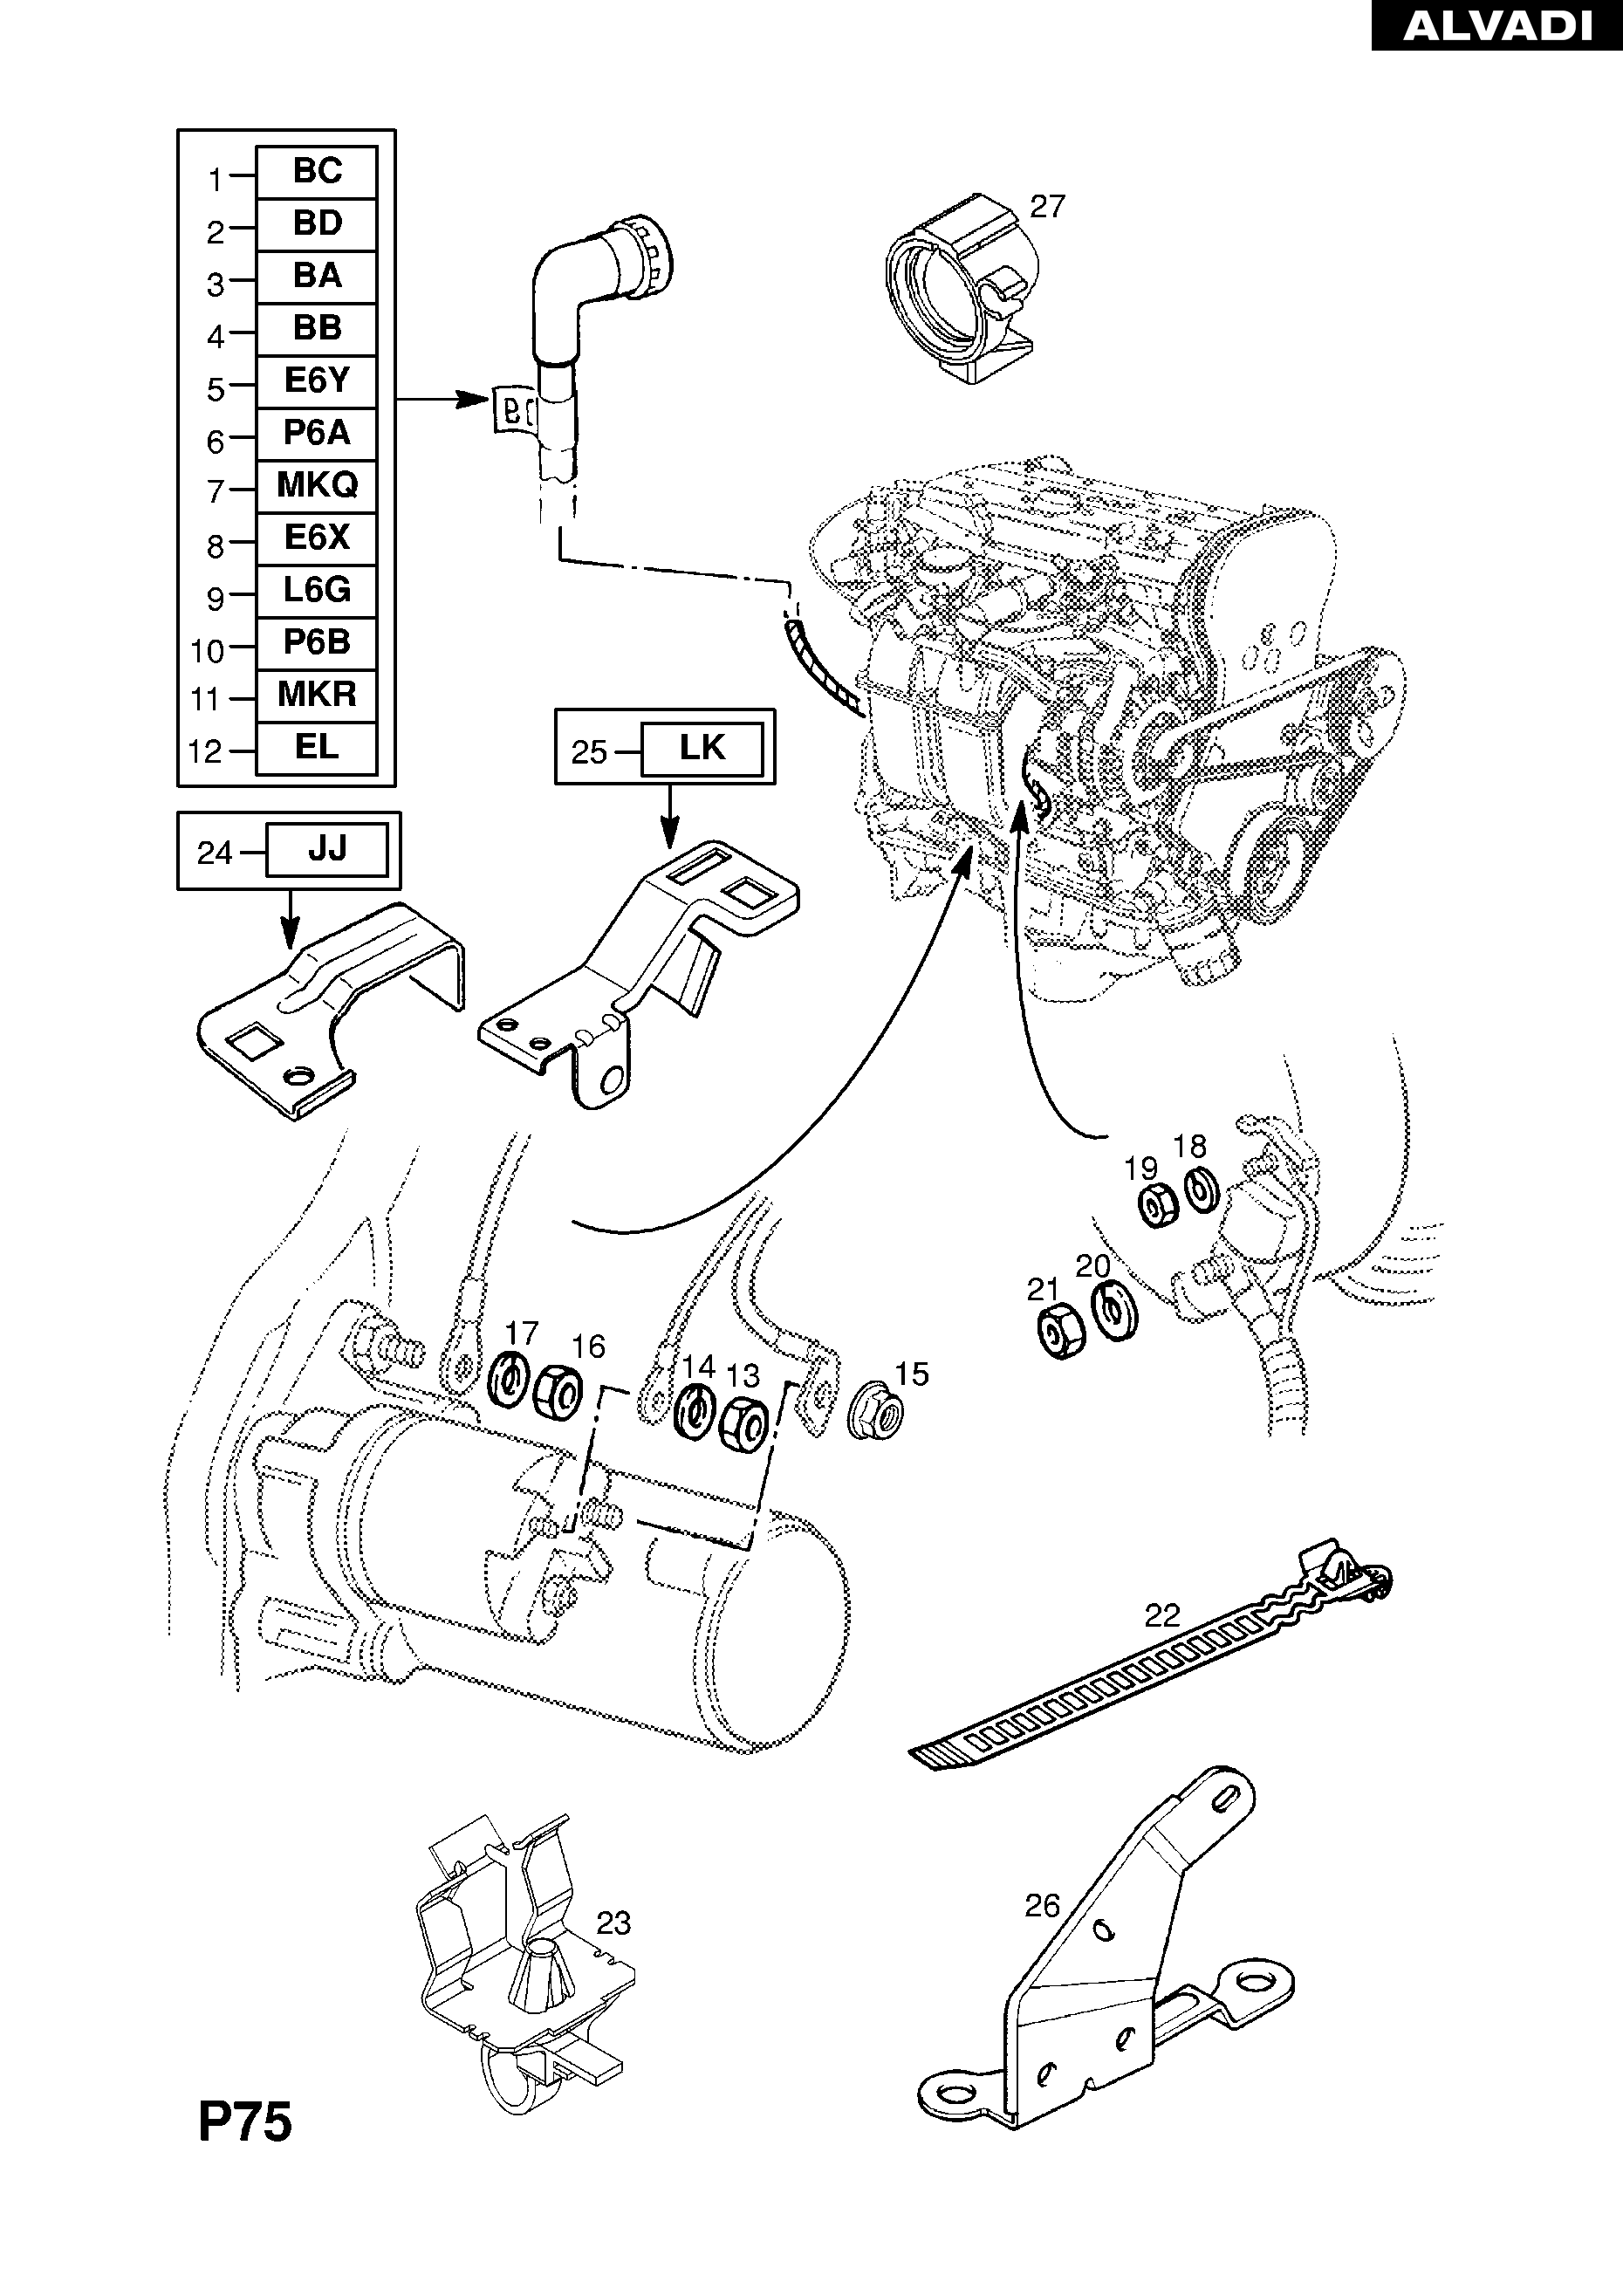 vauxhall sintra wiring diagram ot 1259  vauxhall engine diagrams download diagram  vauxhall engine diagrams download diagram